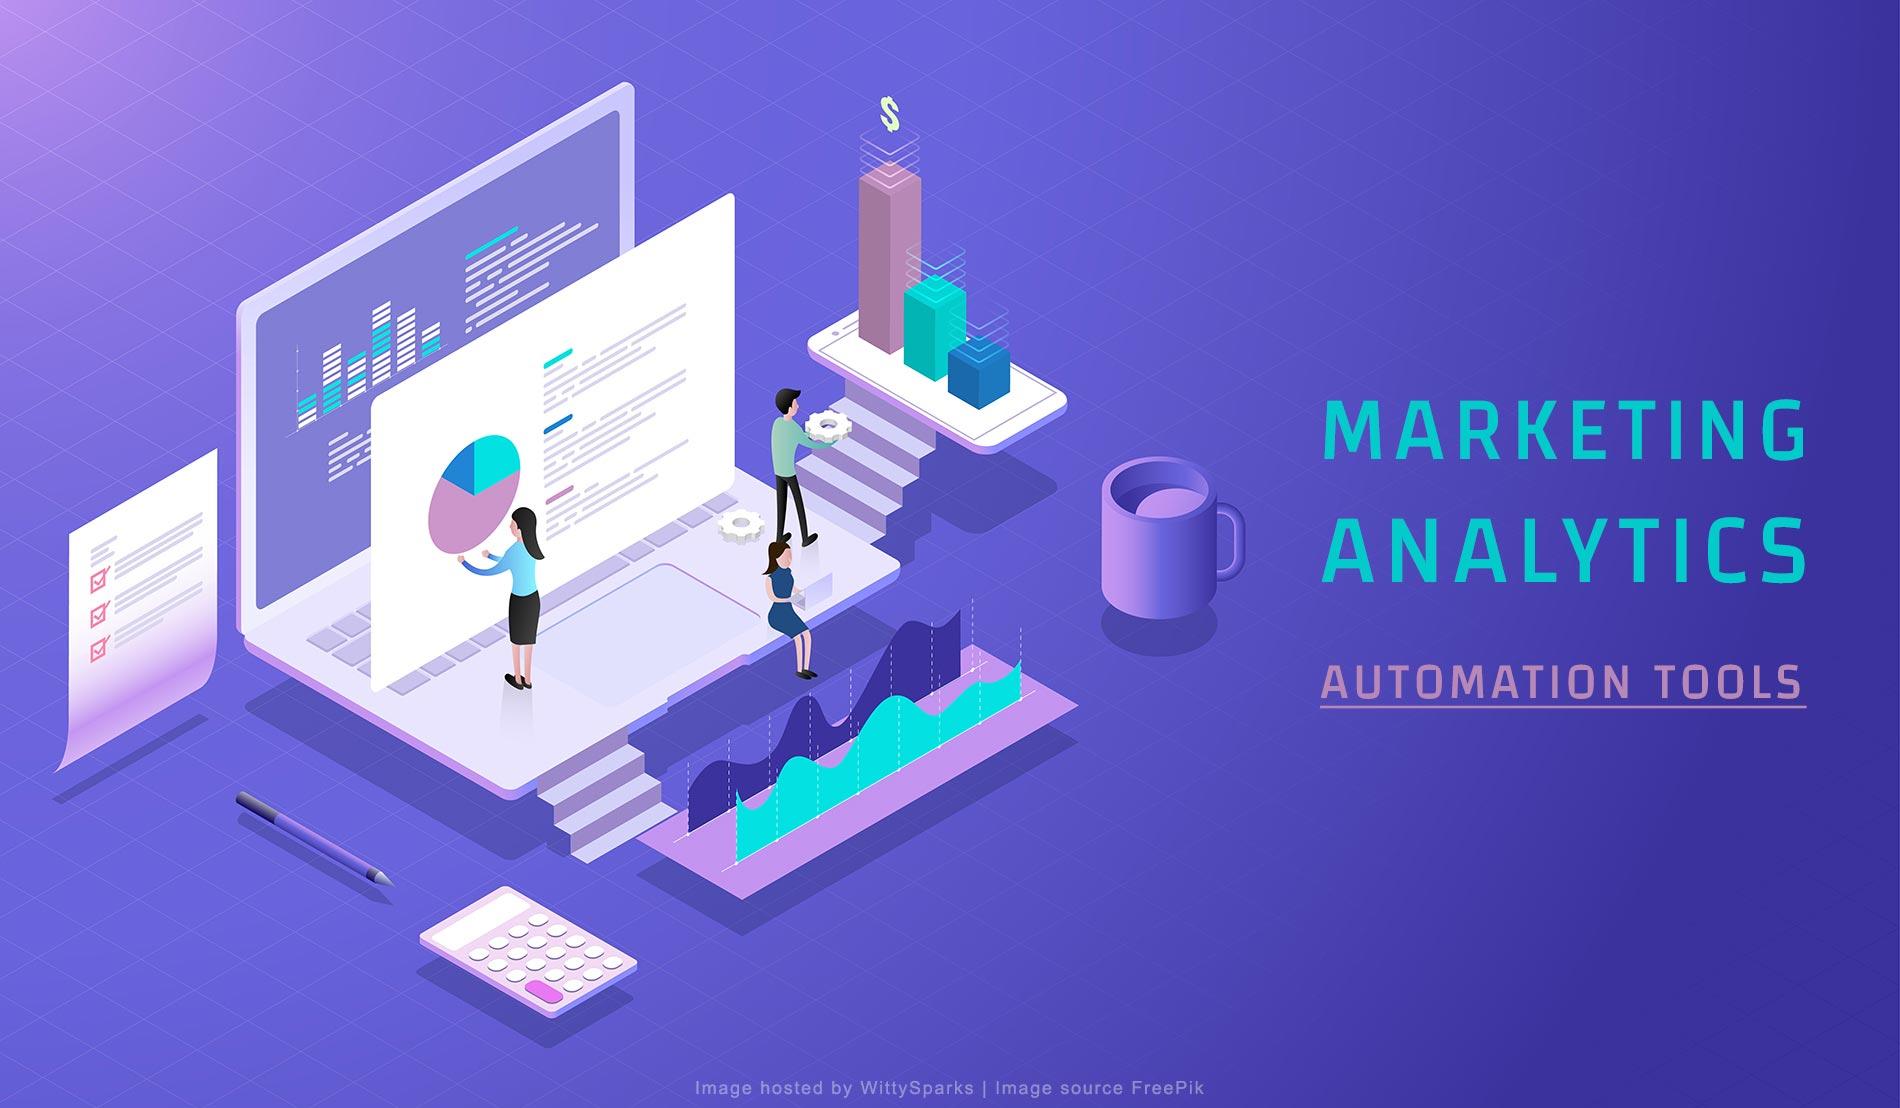 Marketing analytics tools